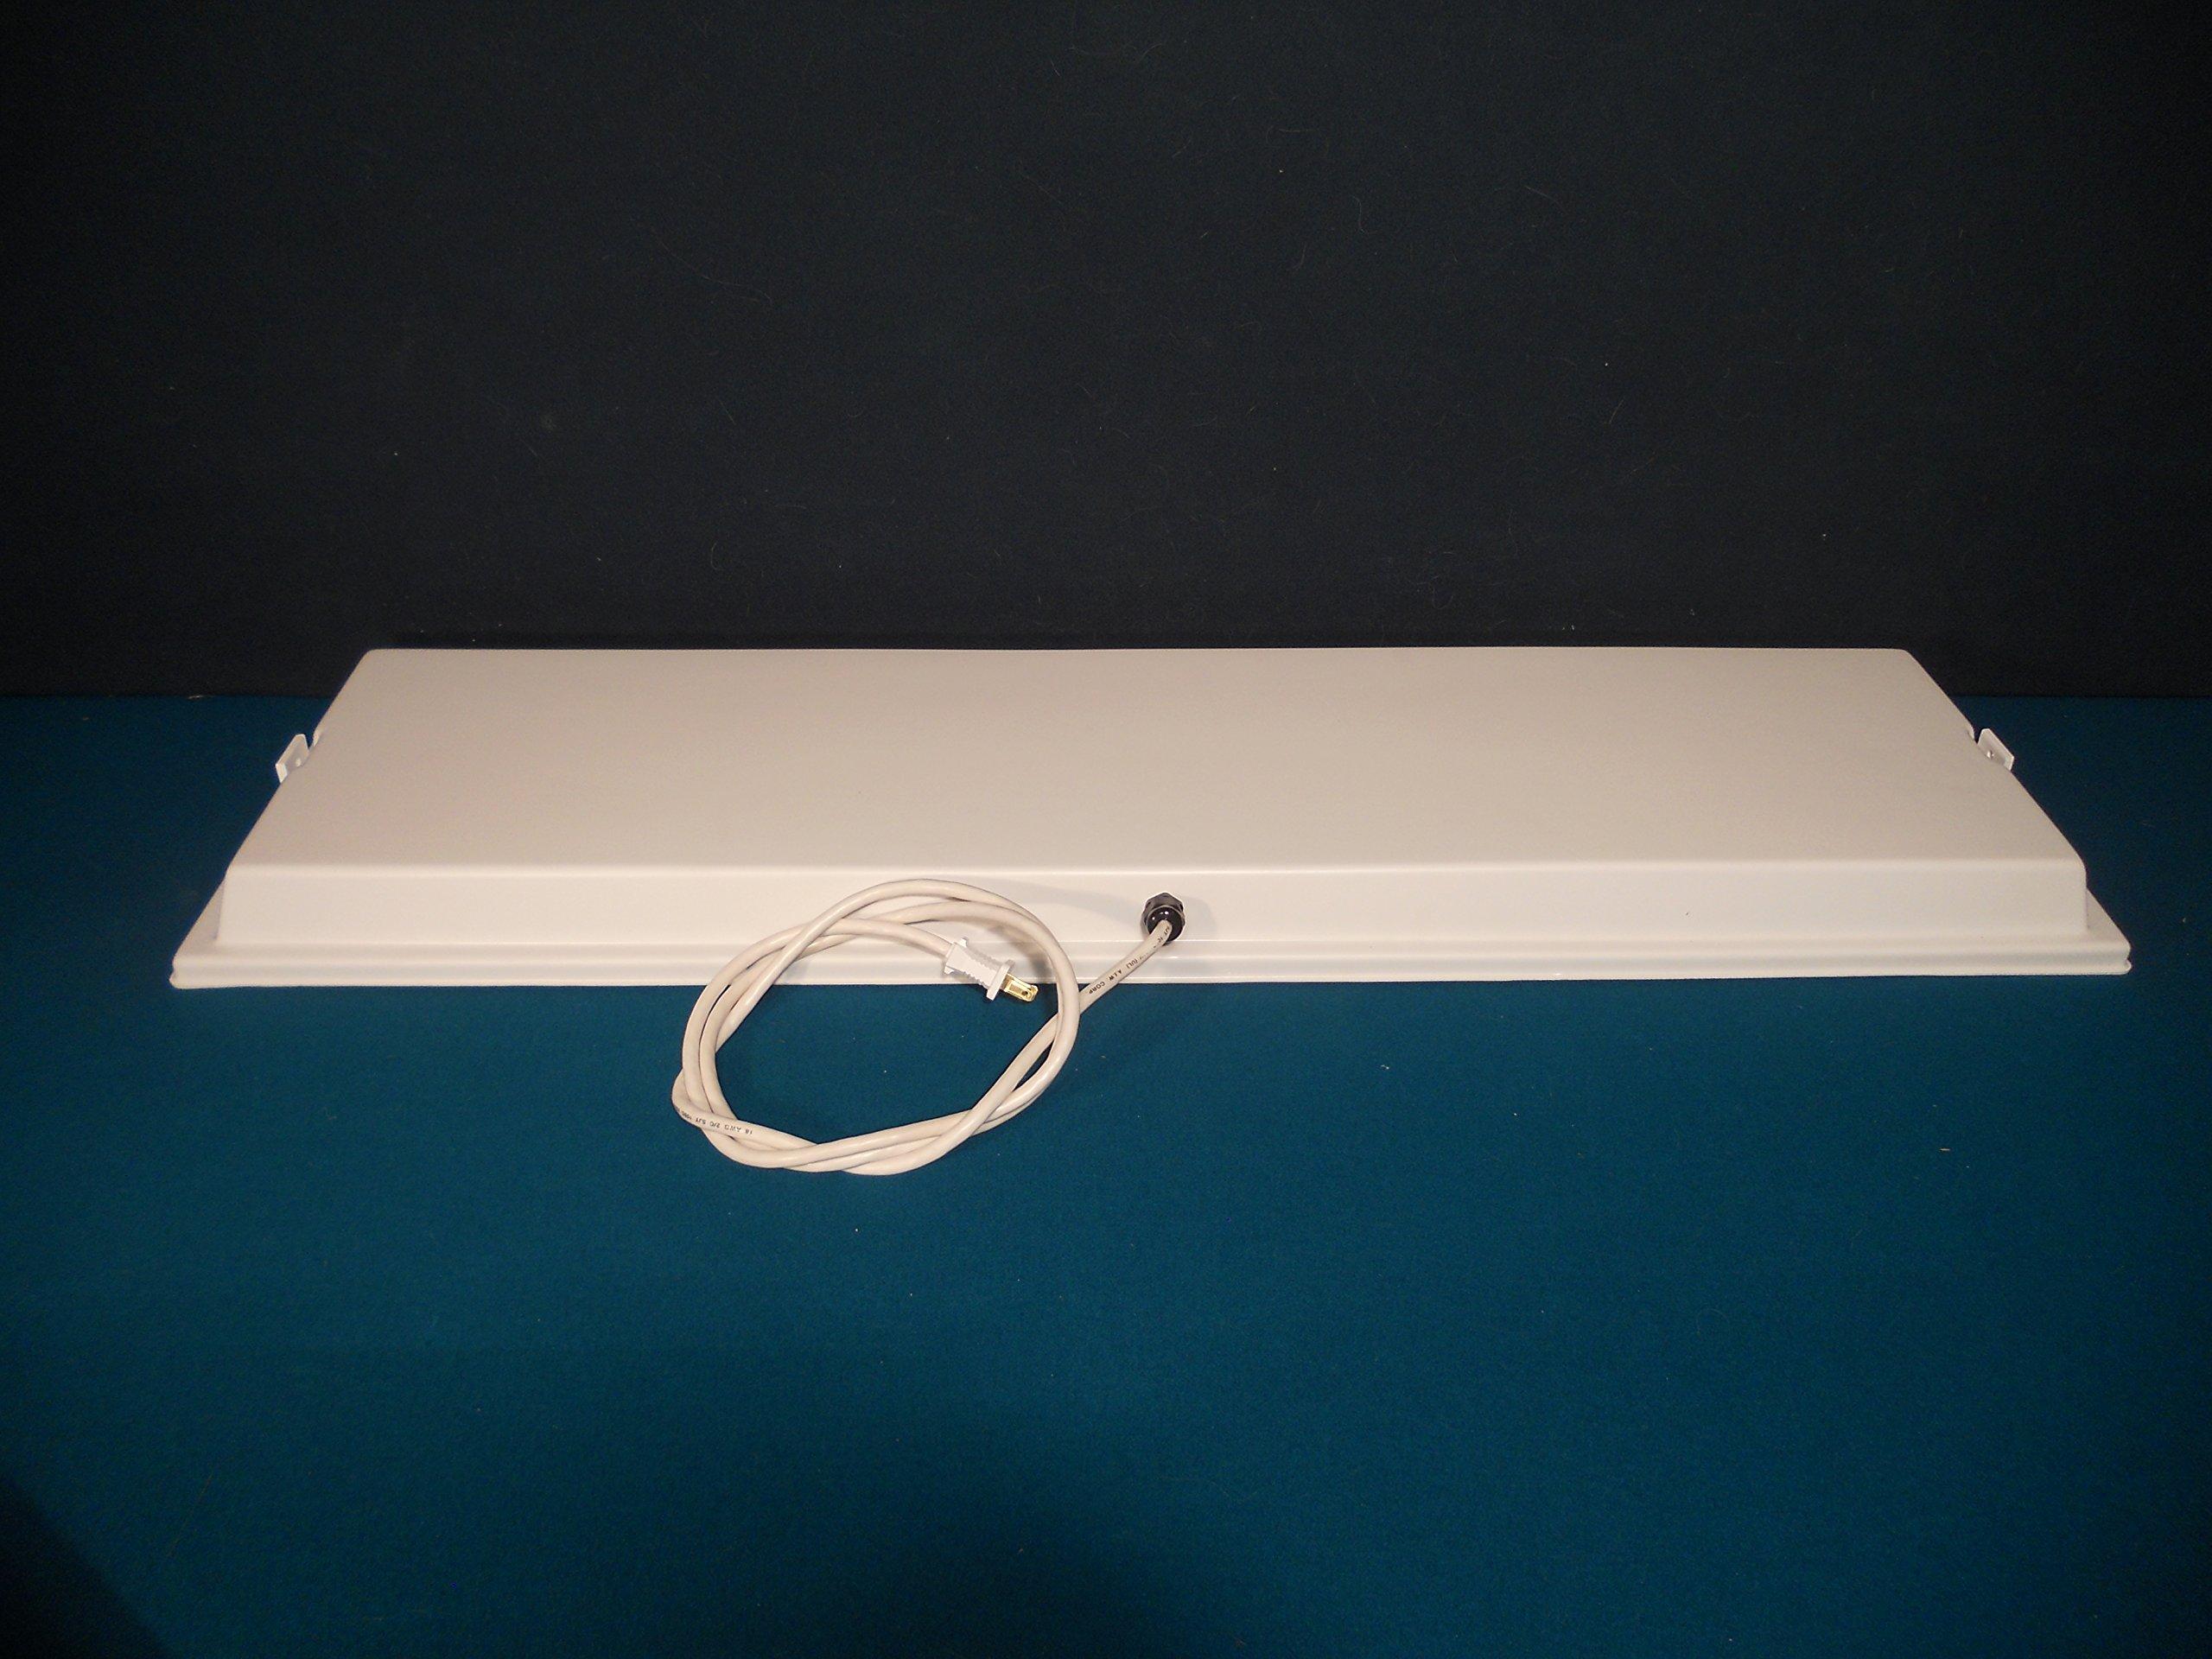 SWEETER HEATER Infrared Heater for Chicks & Pets, Side Mount 11x40, 150 Watt